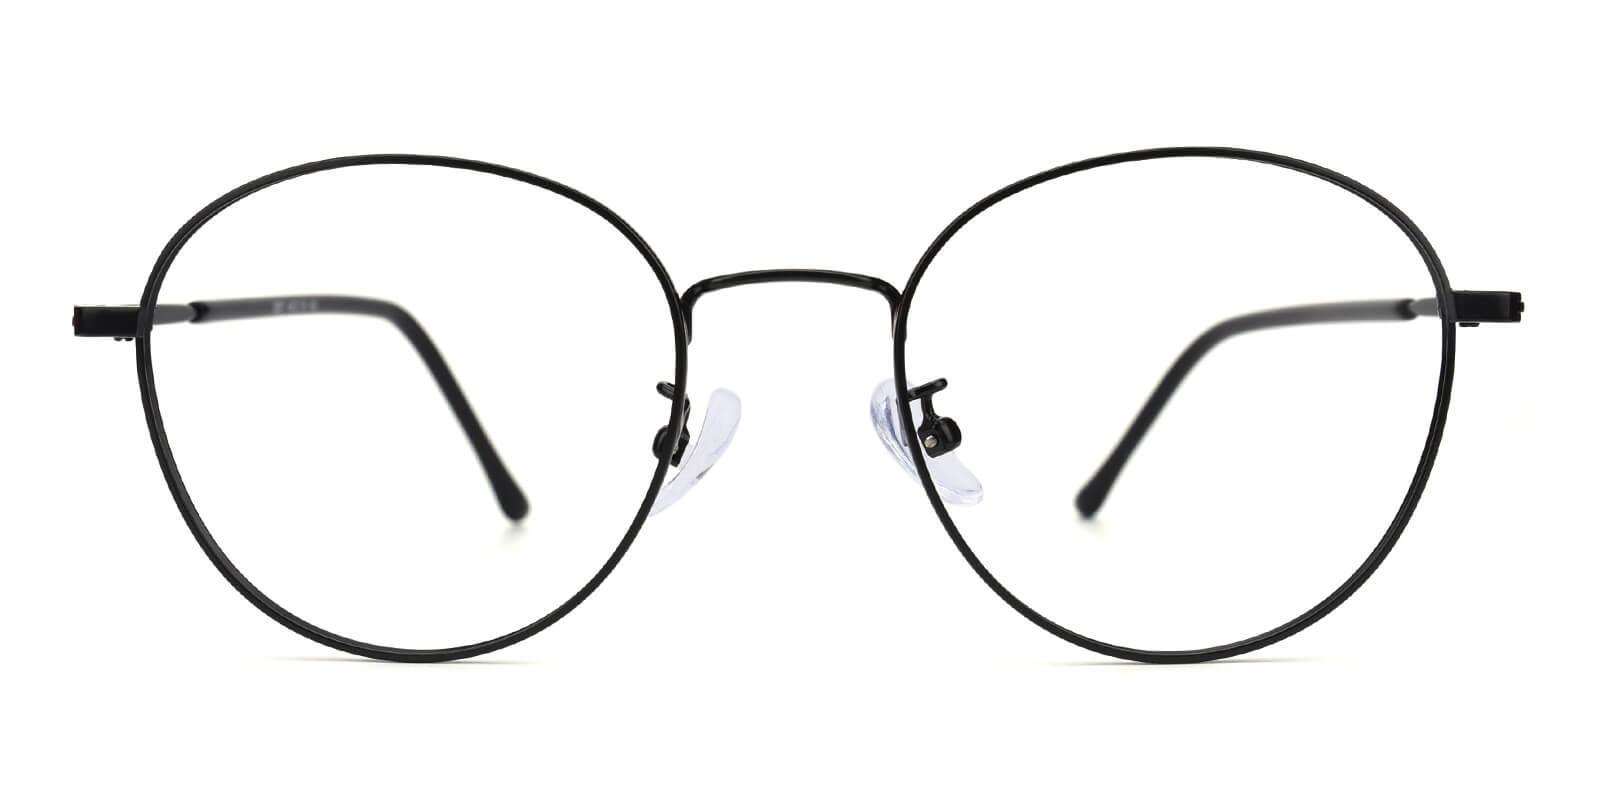 Devi-Black-Round-Metal-Eyeglasses-detail